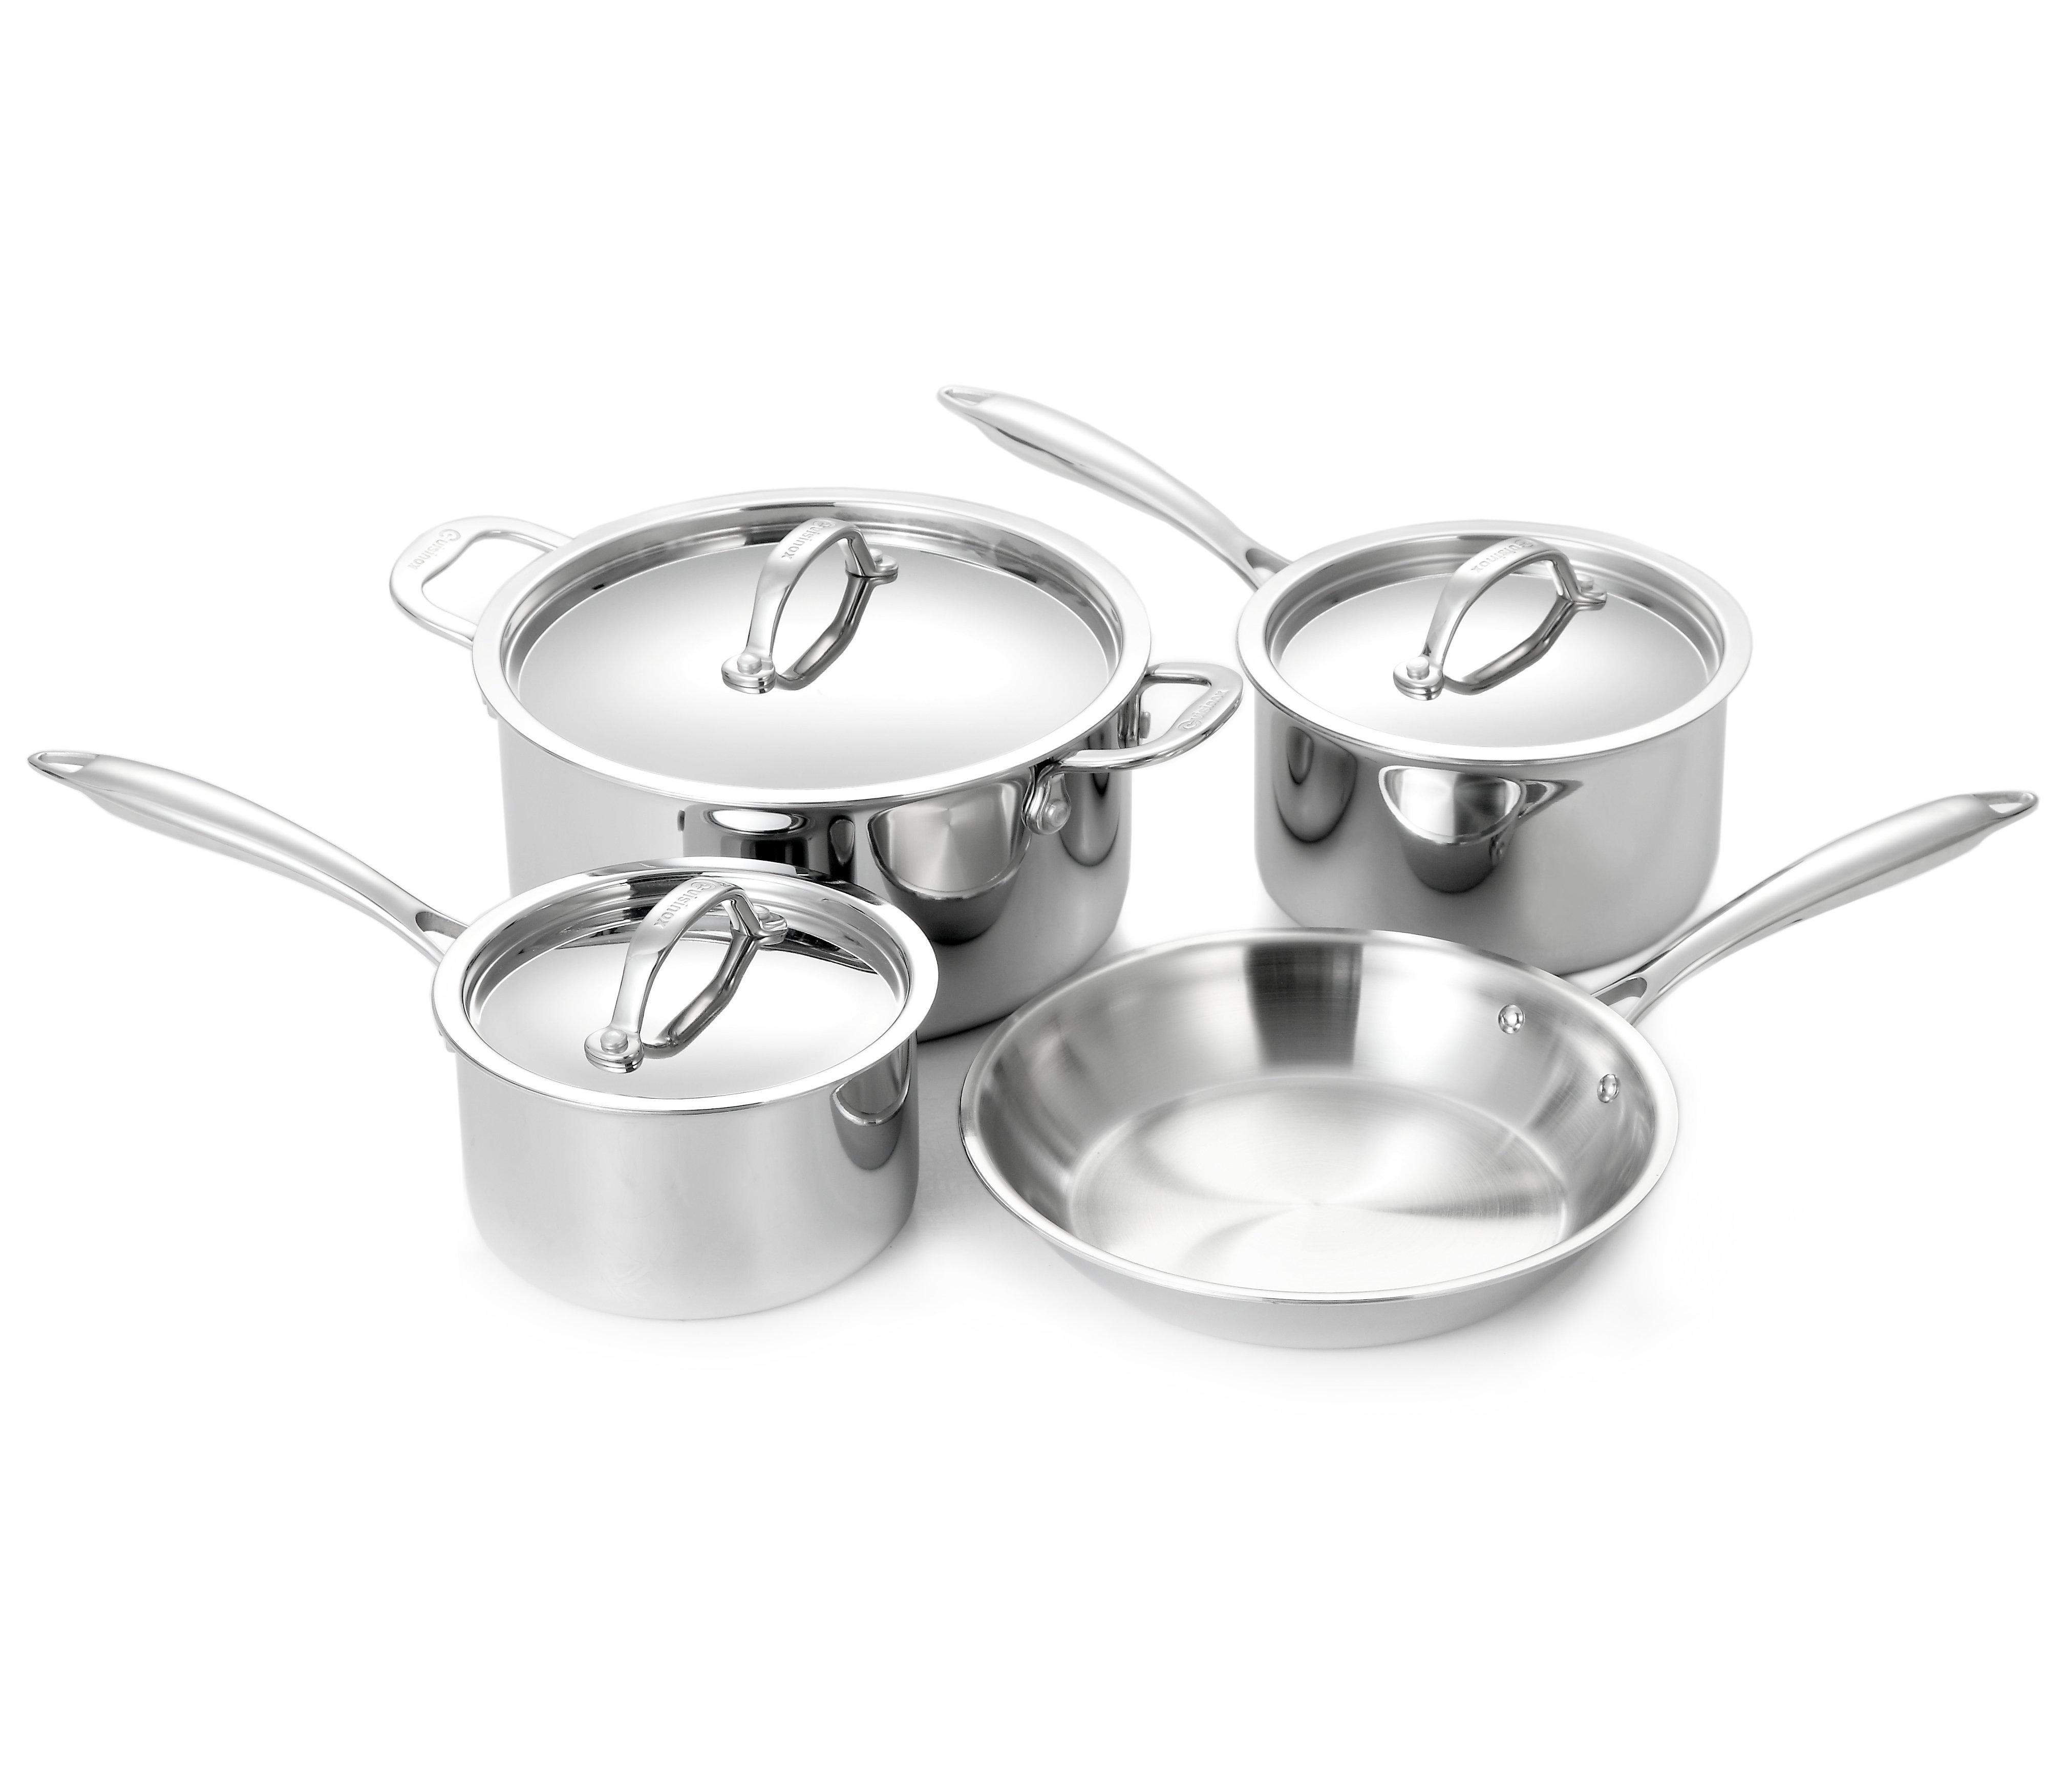 Cuisinox Super Elite 7 Piece Cookware Set gimme the good stuff